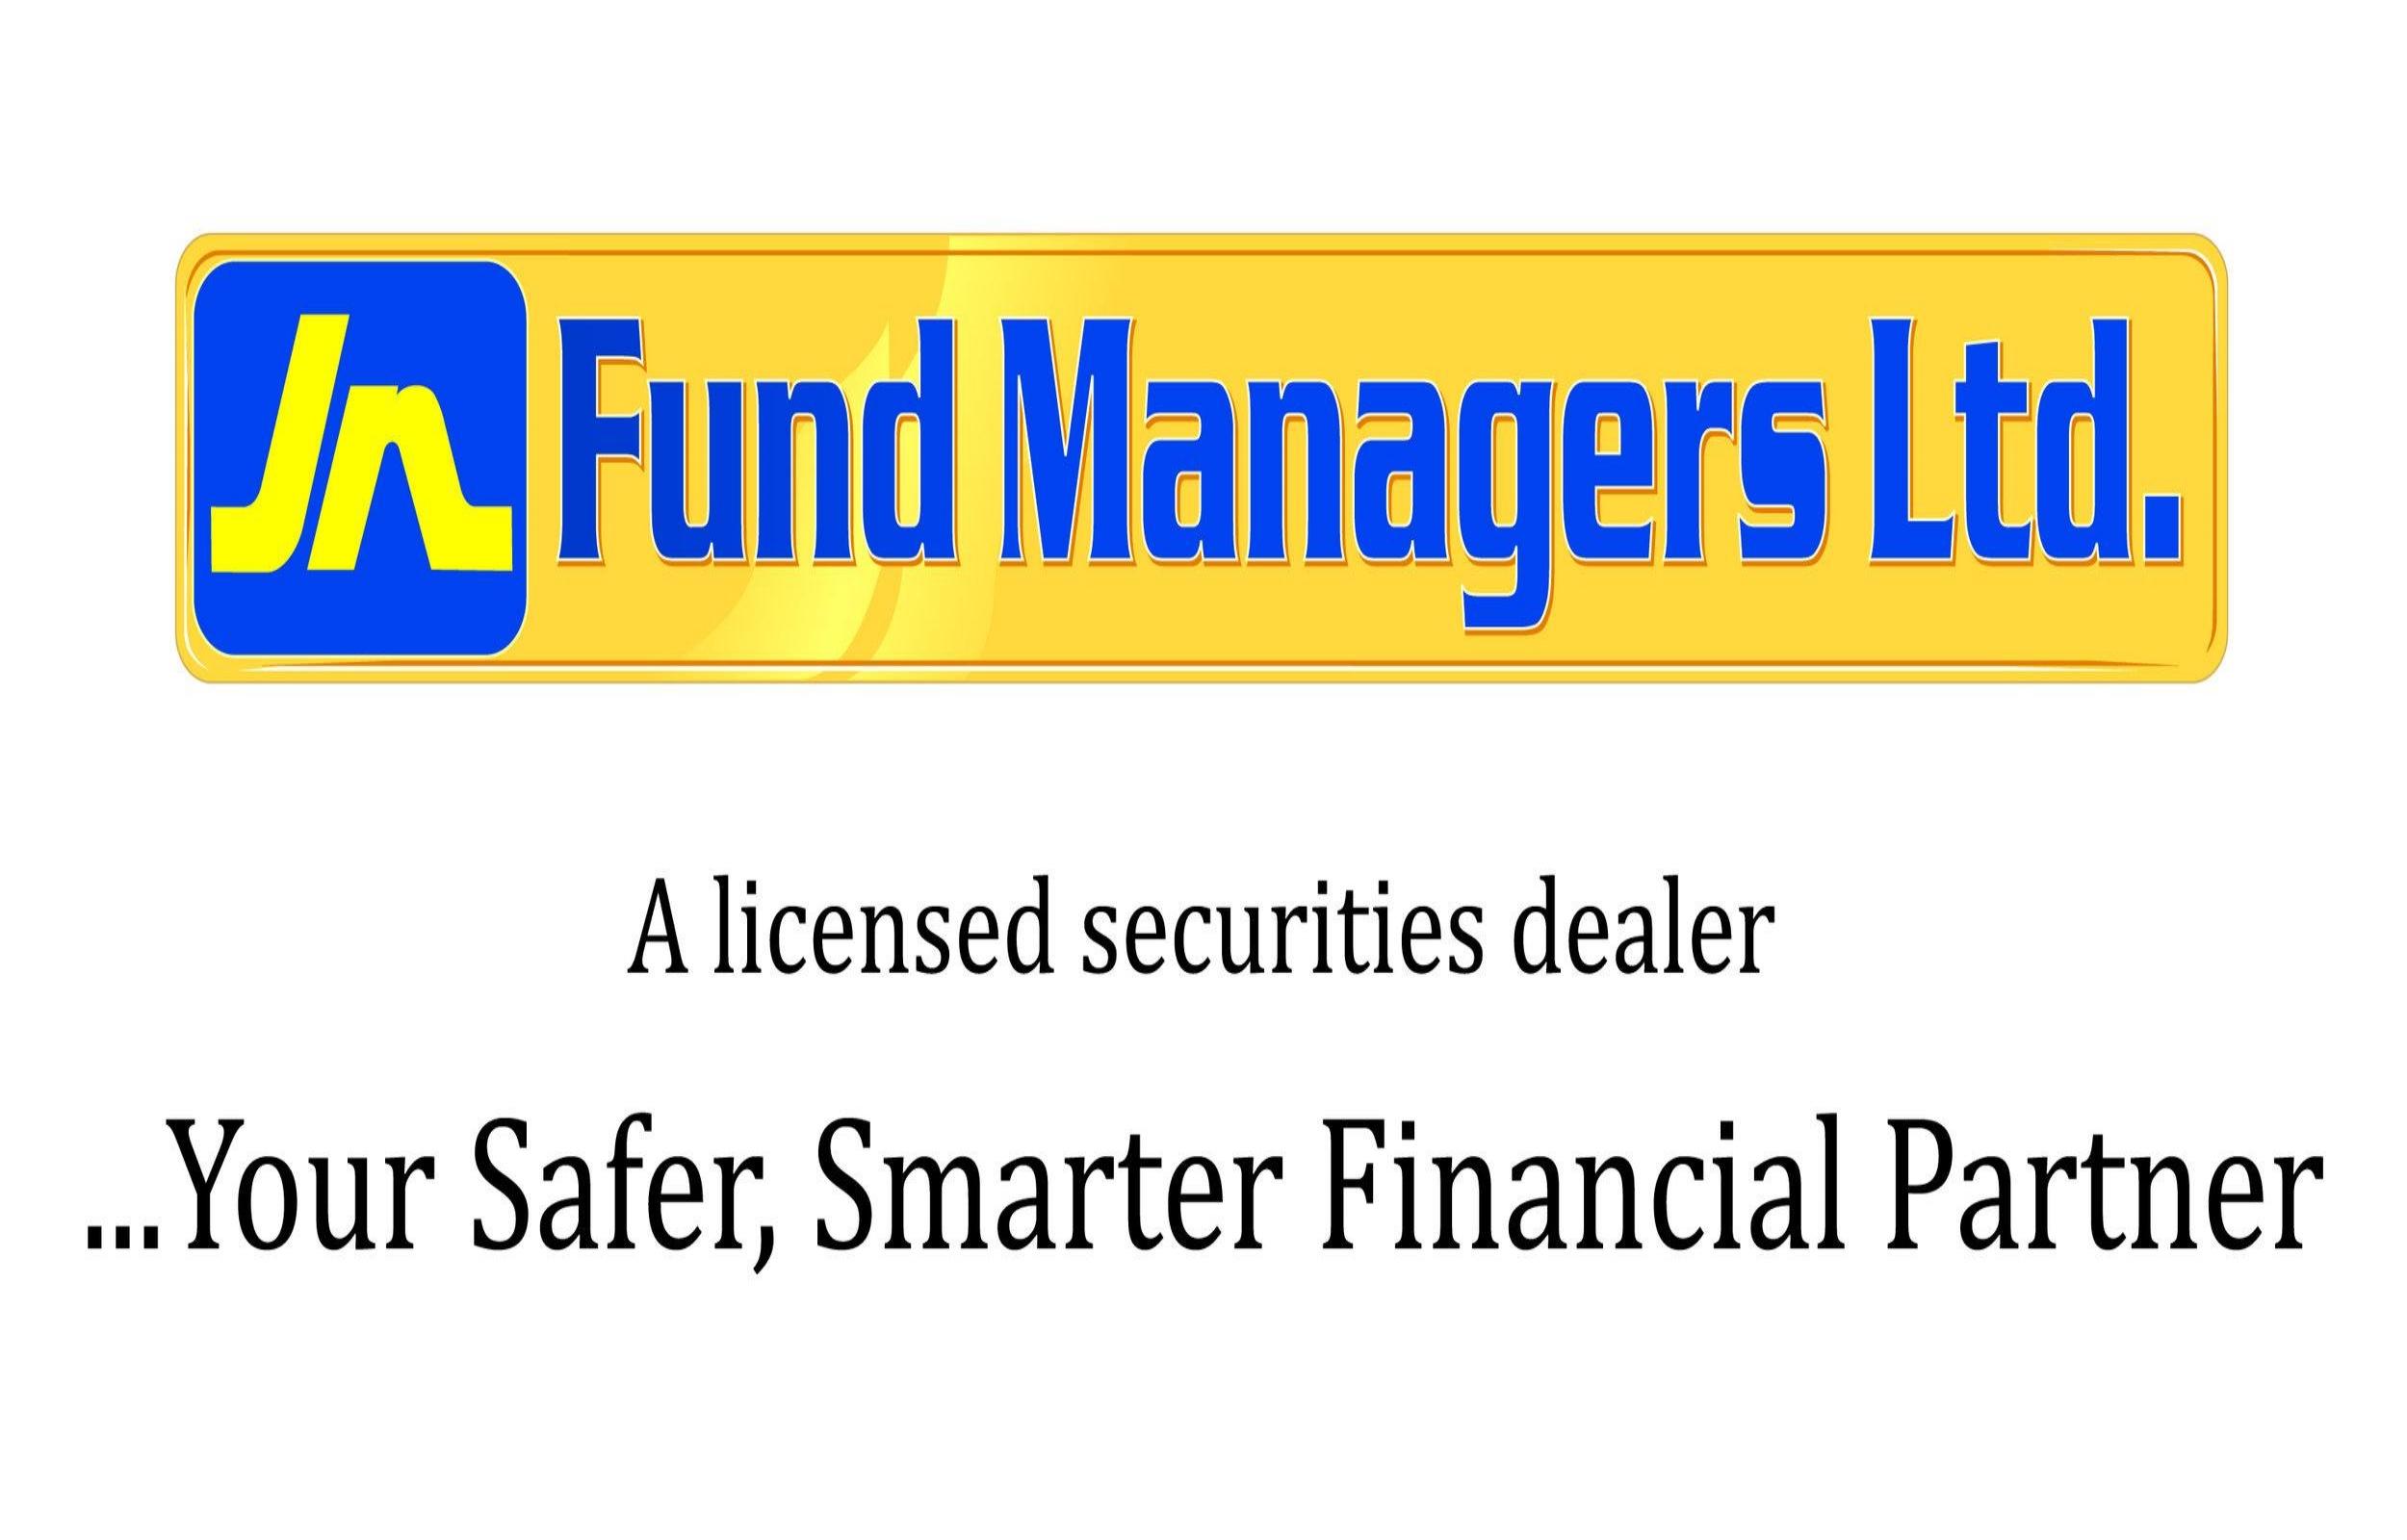 JN-FUND-MANAGERS-LTD.-LOGO.jpg